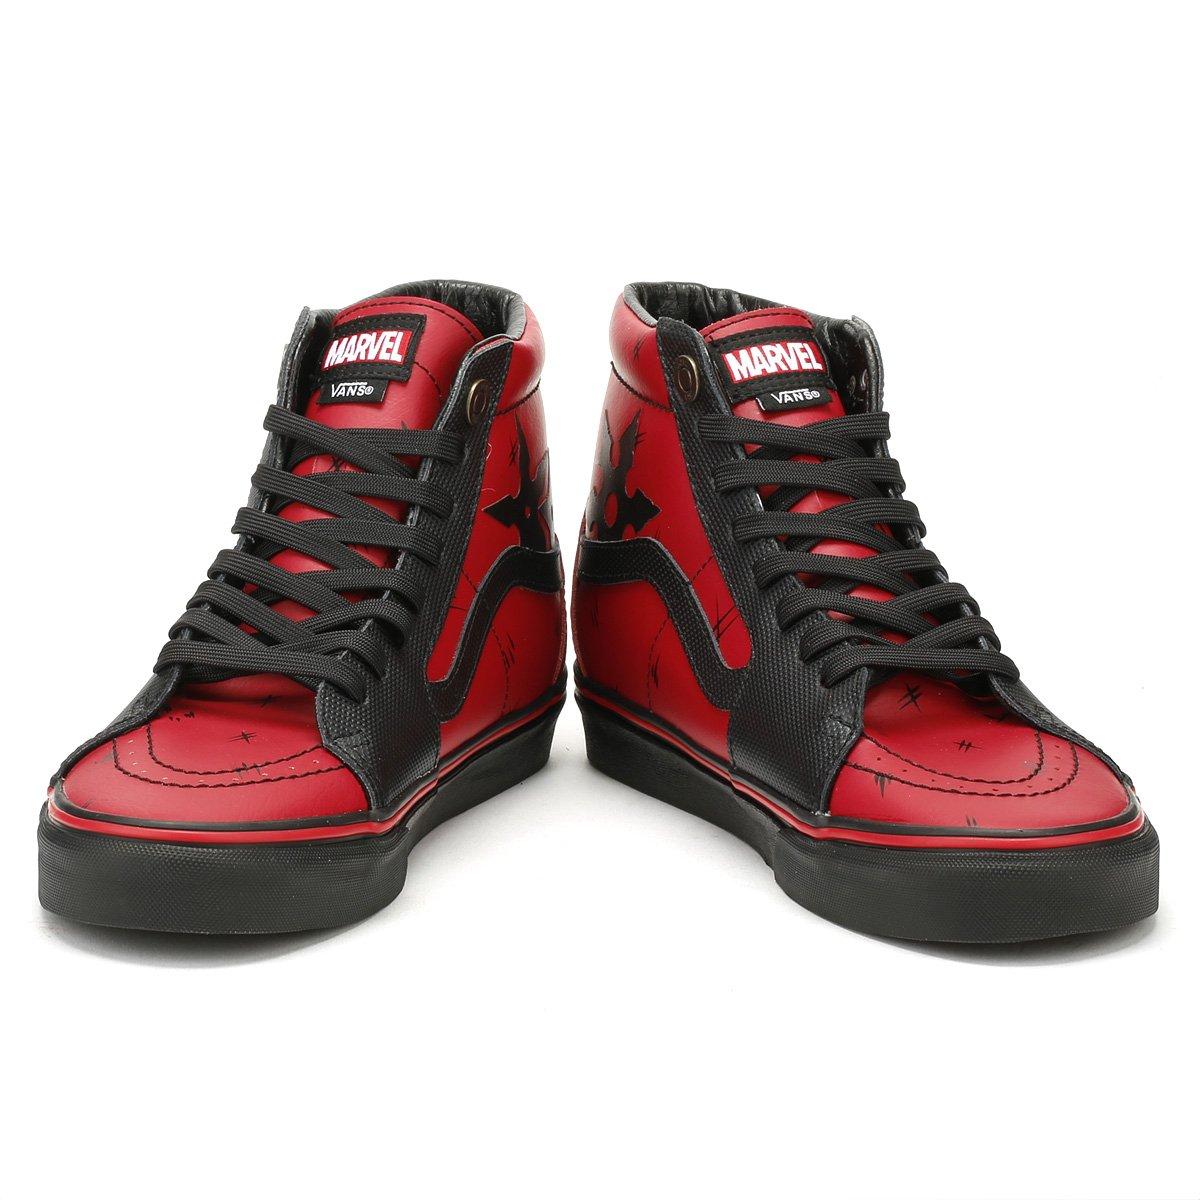 d35ea1afa98 Vans Marvel Deadpool Black SK8-Hi Trainers-UK 4  Amazon.co.uk  Shoes   Bags